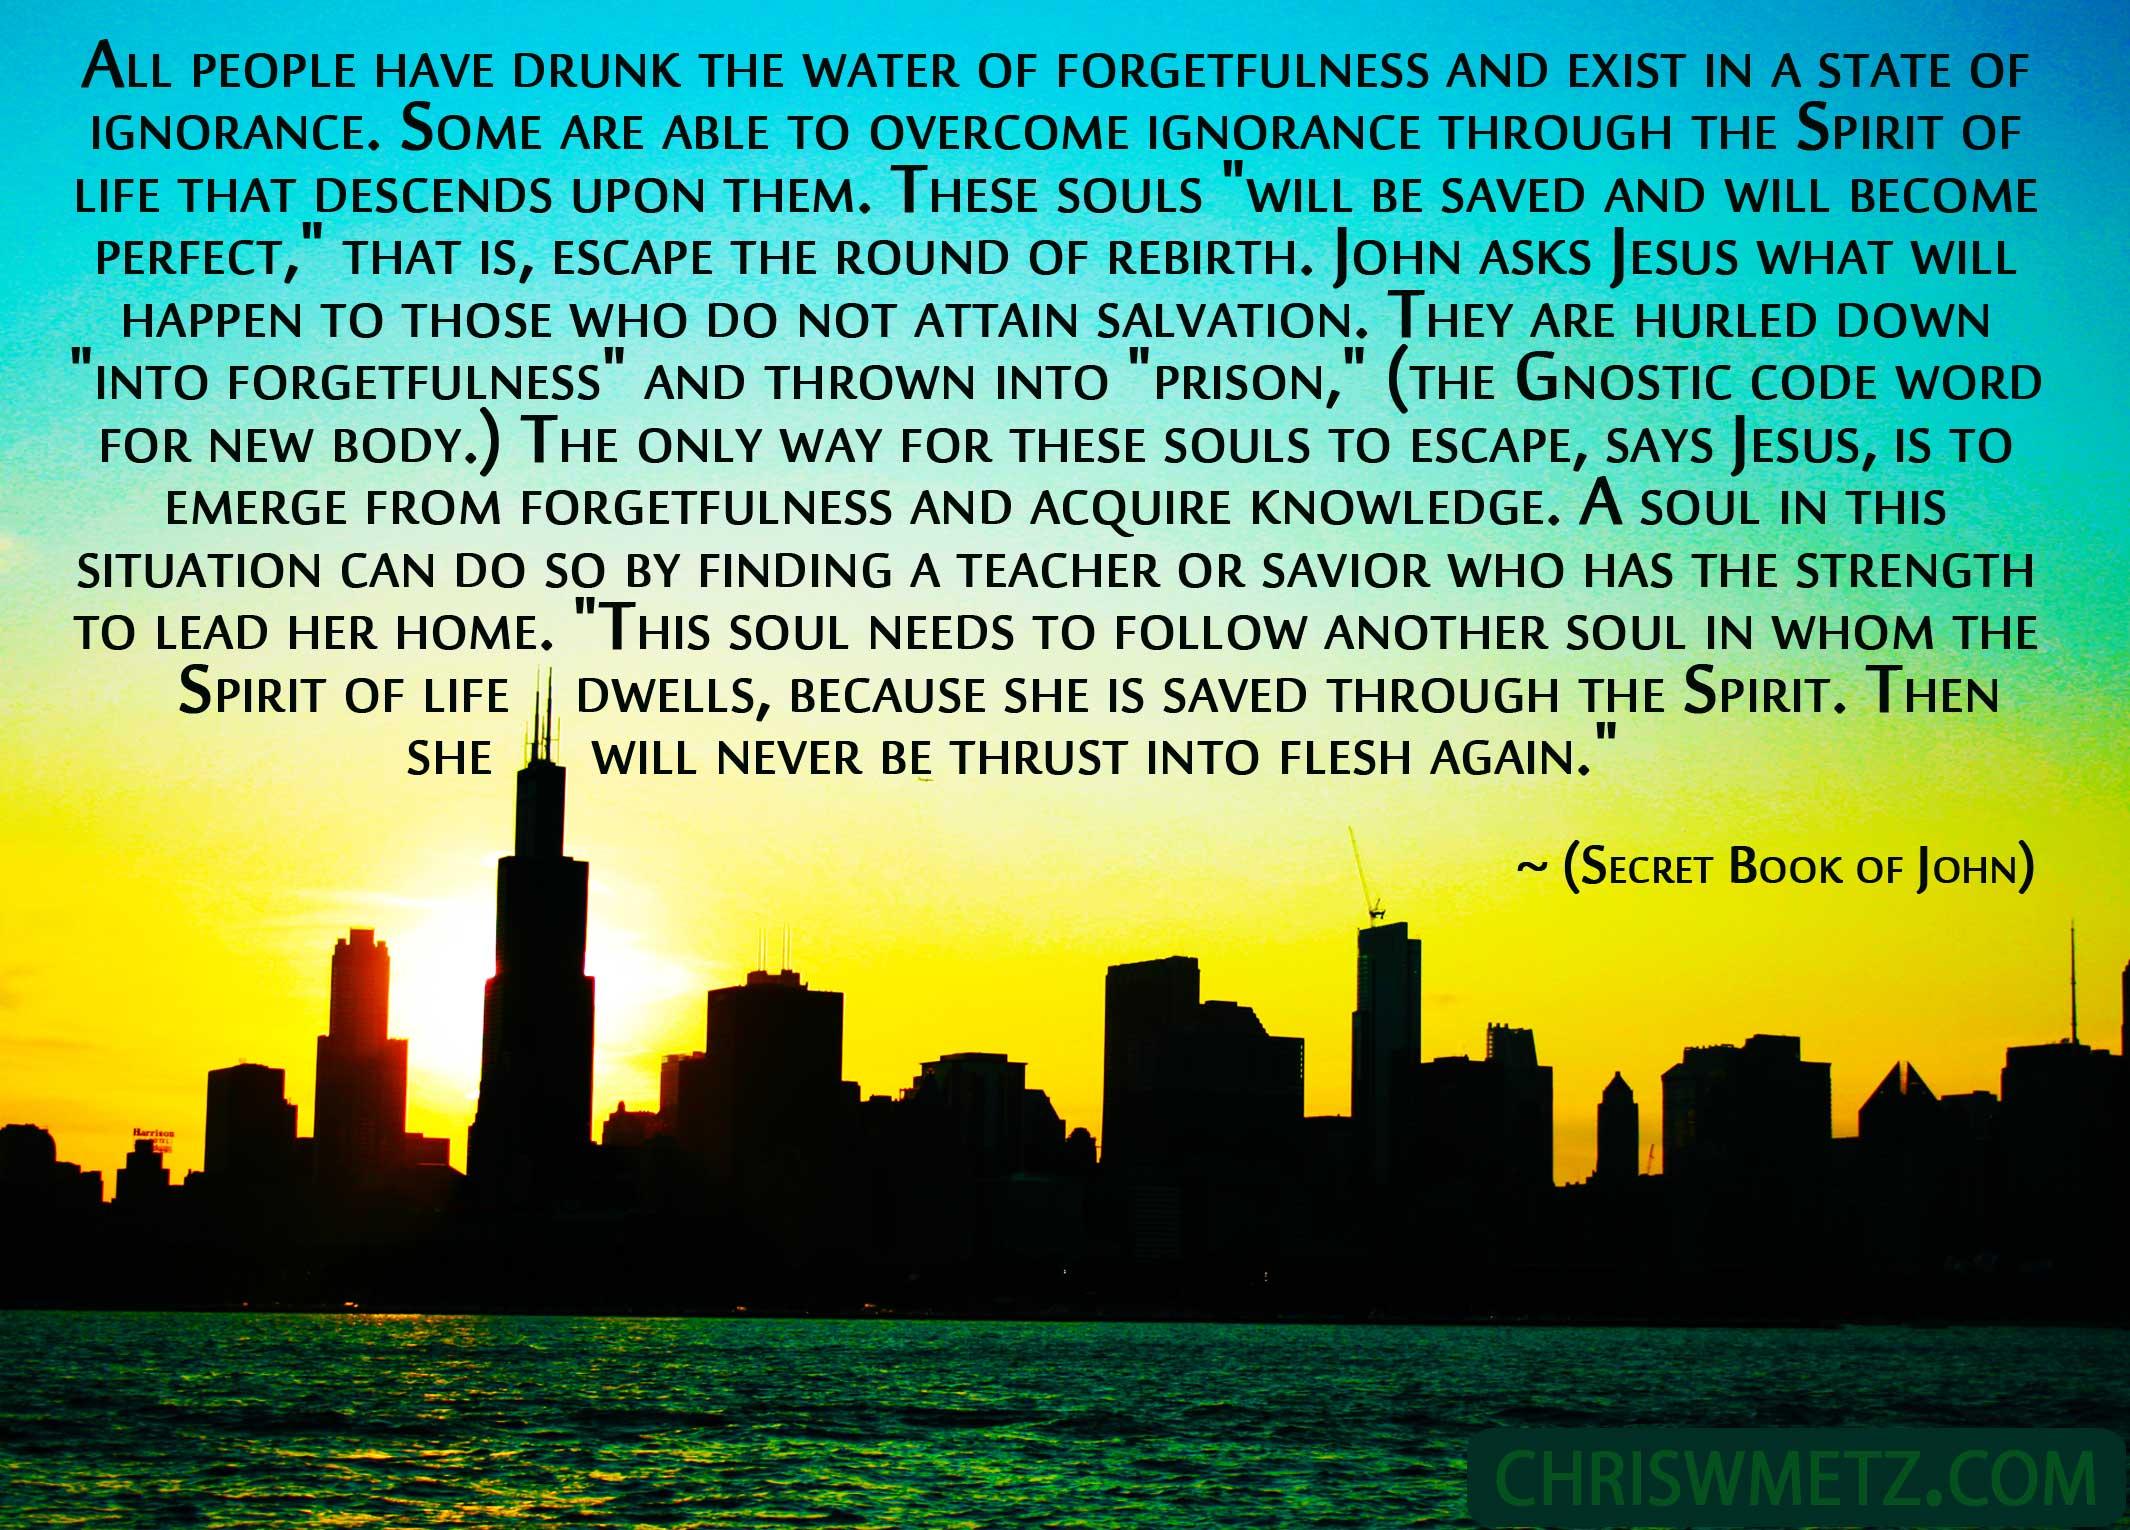 Soul Quote 7 Jesus - Secret Book Of John